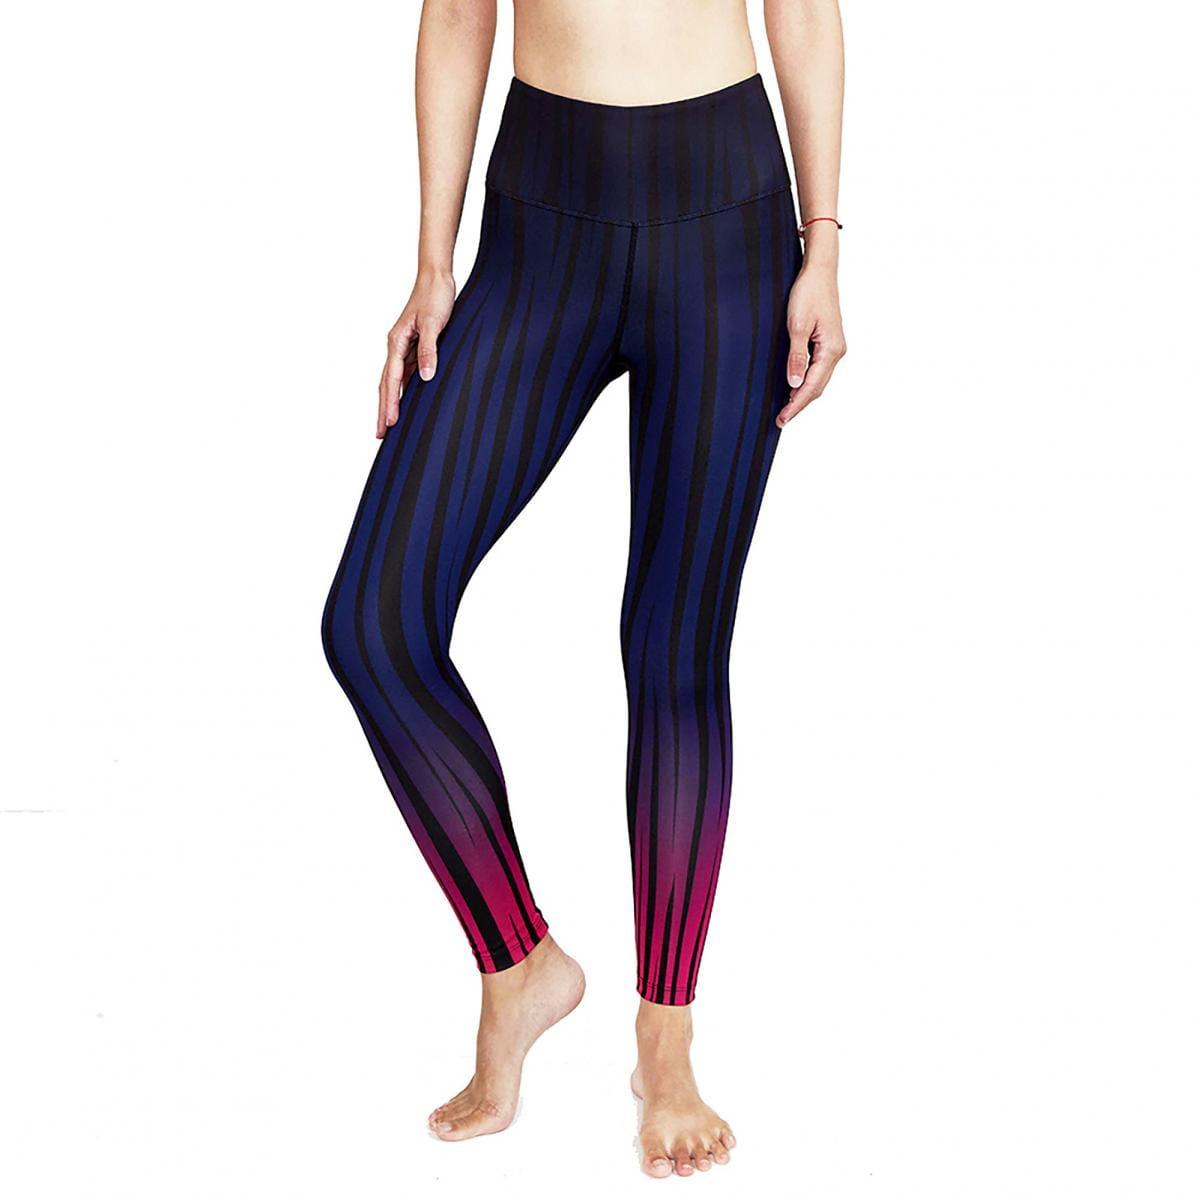 【ELASTI】典莎瑜珈褲(碘紗抗菌除臭機能)-迷幻斑馬 1